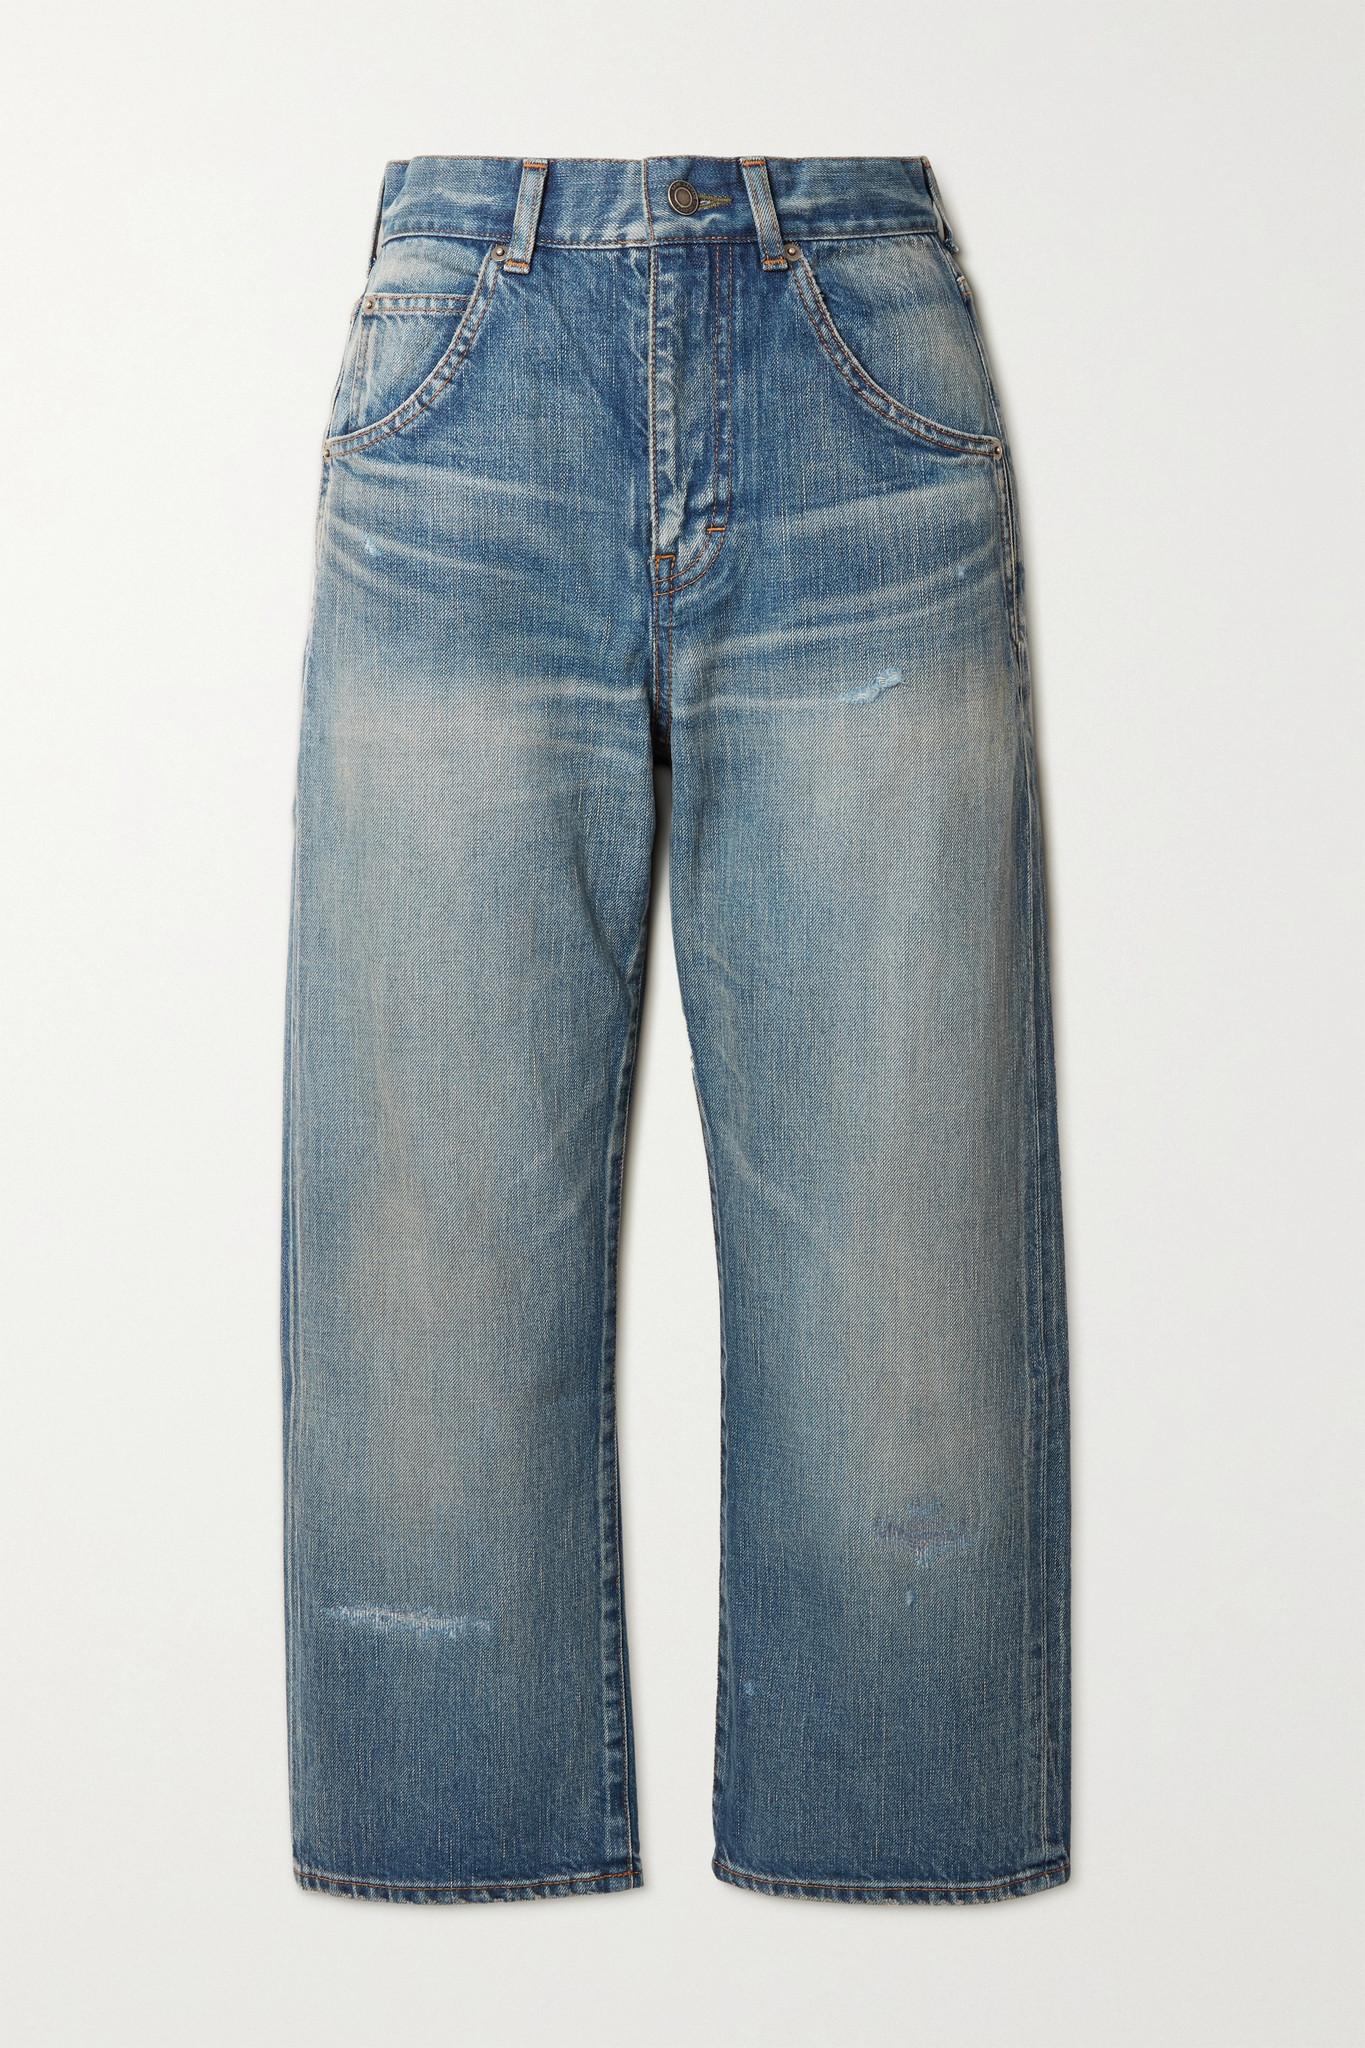 SAINT LAURENT - Cropped High-rise Straight-leg Jeans - Blue - 24